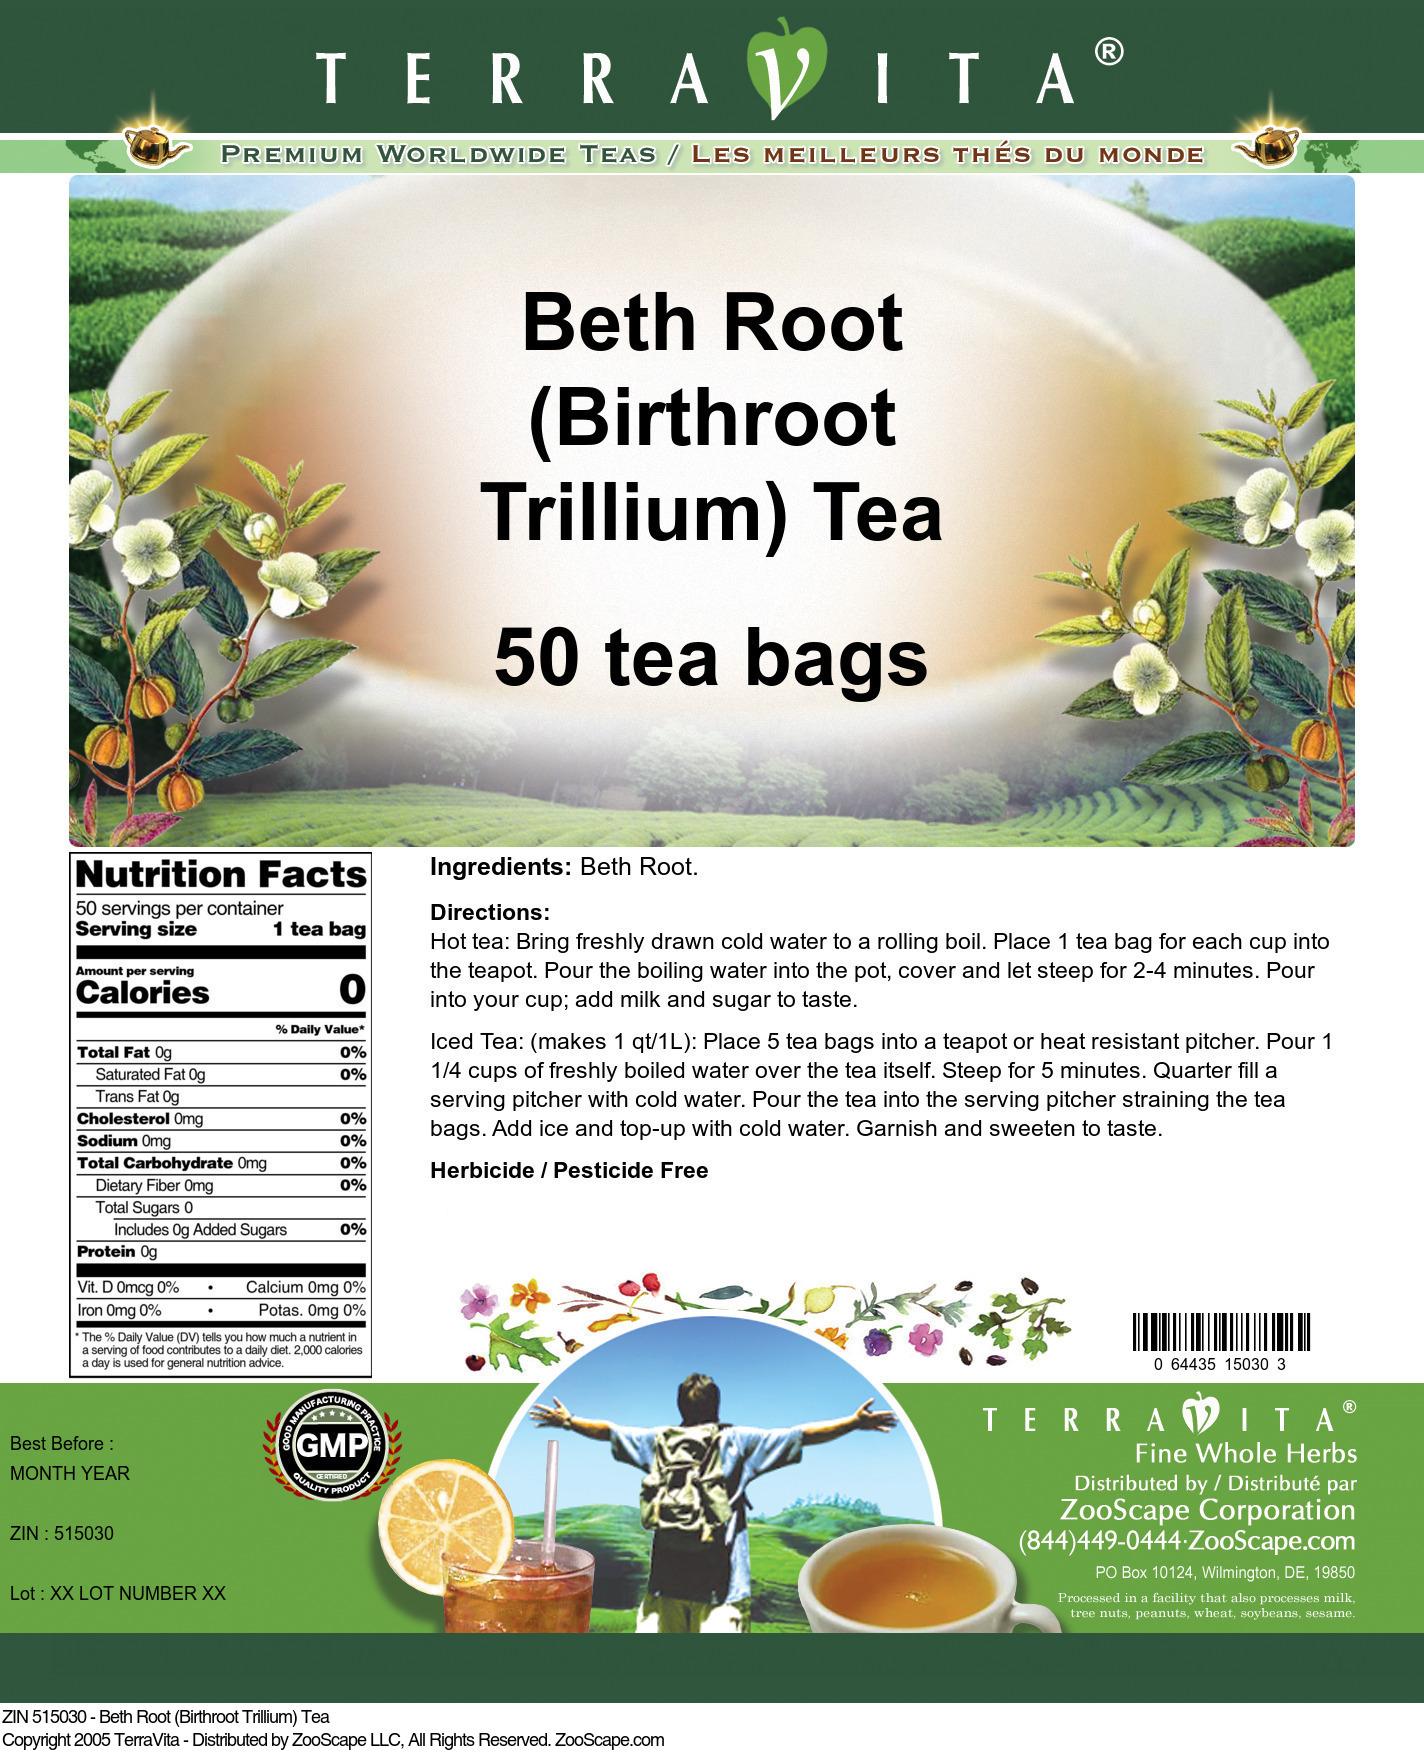 Beth Root